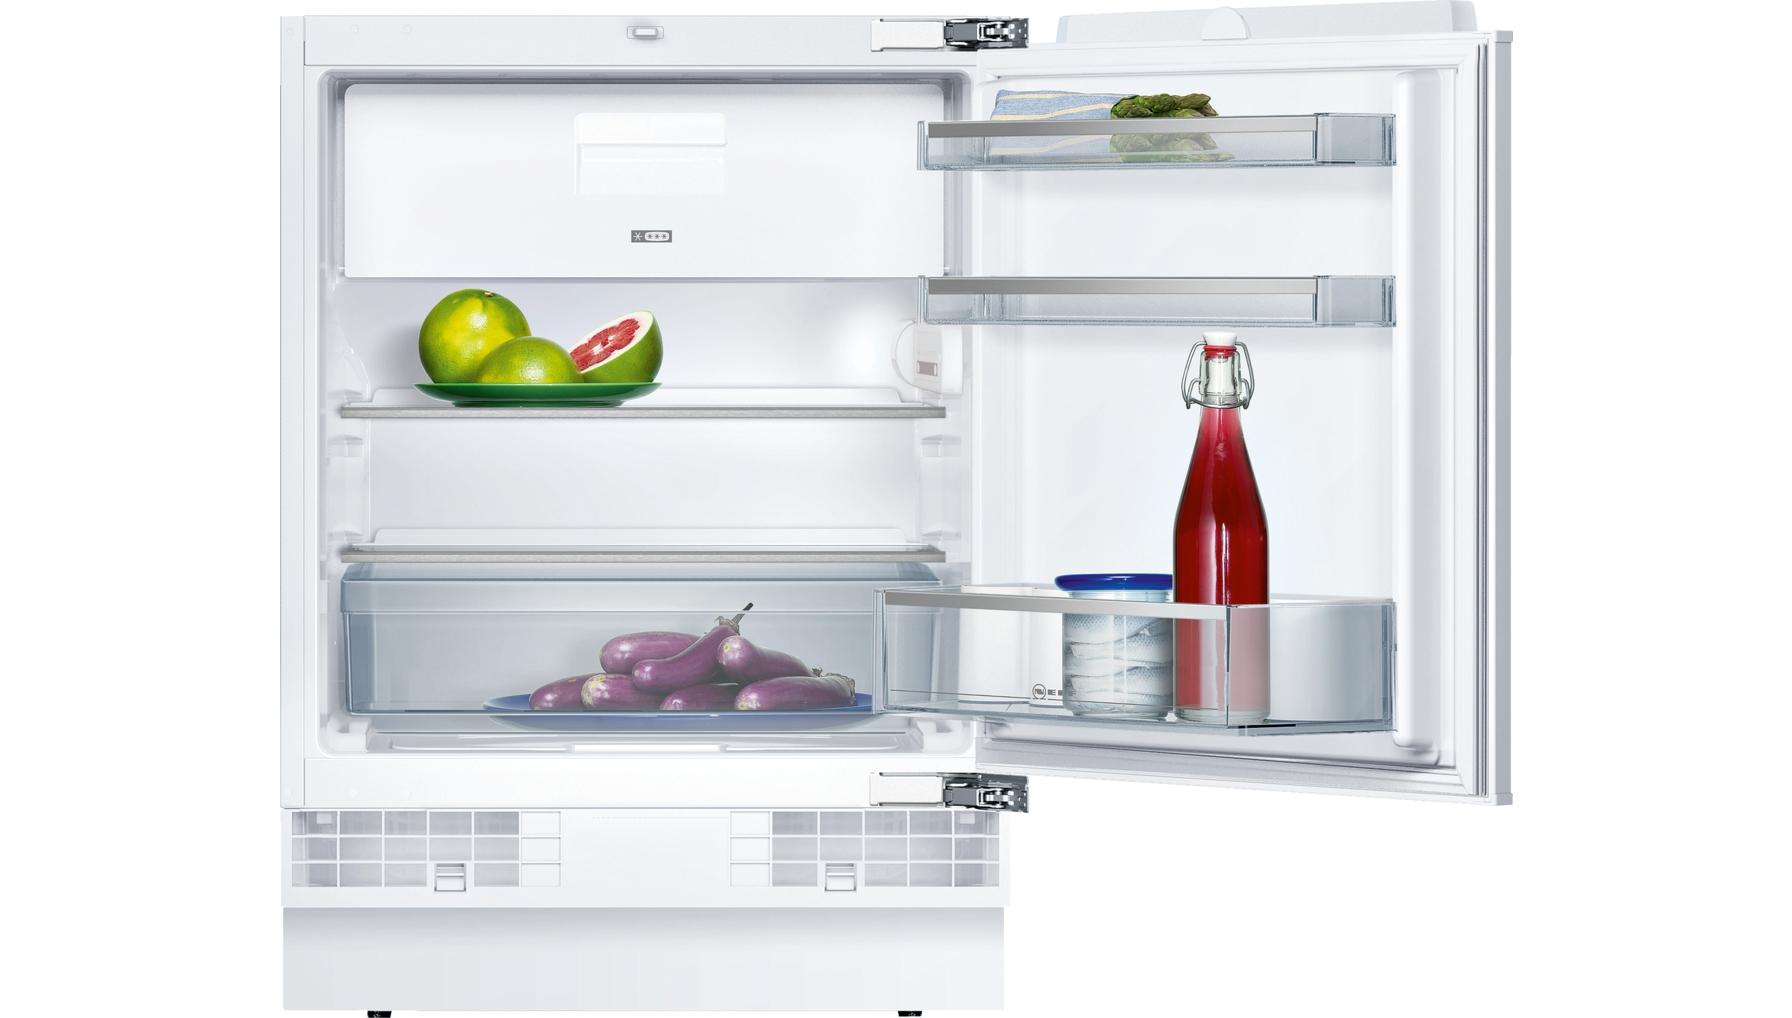 Siemens Kühlschrank Qc 493 : Bosch unterbau kühlschrank kur a unterbau kühlschrank bosch ebay